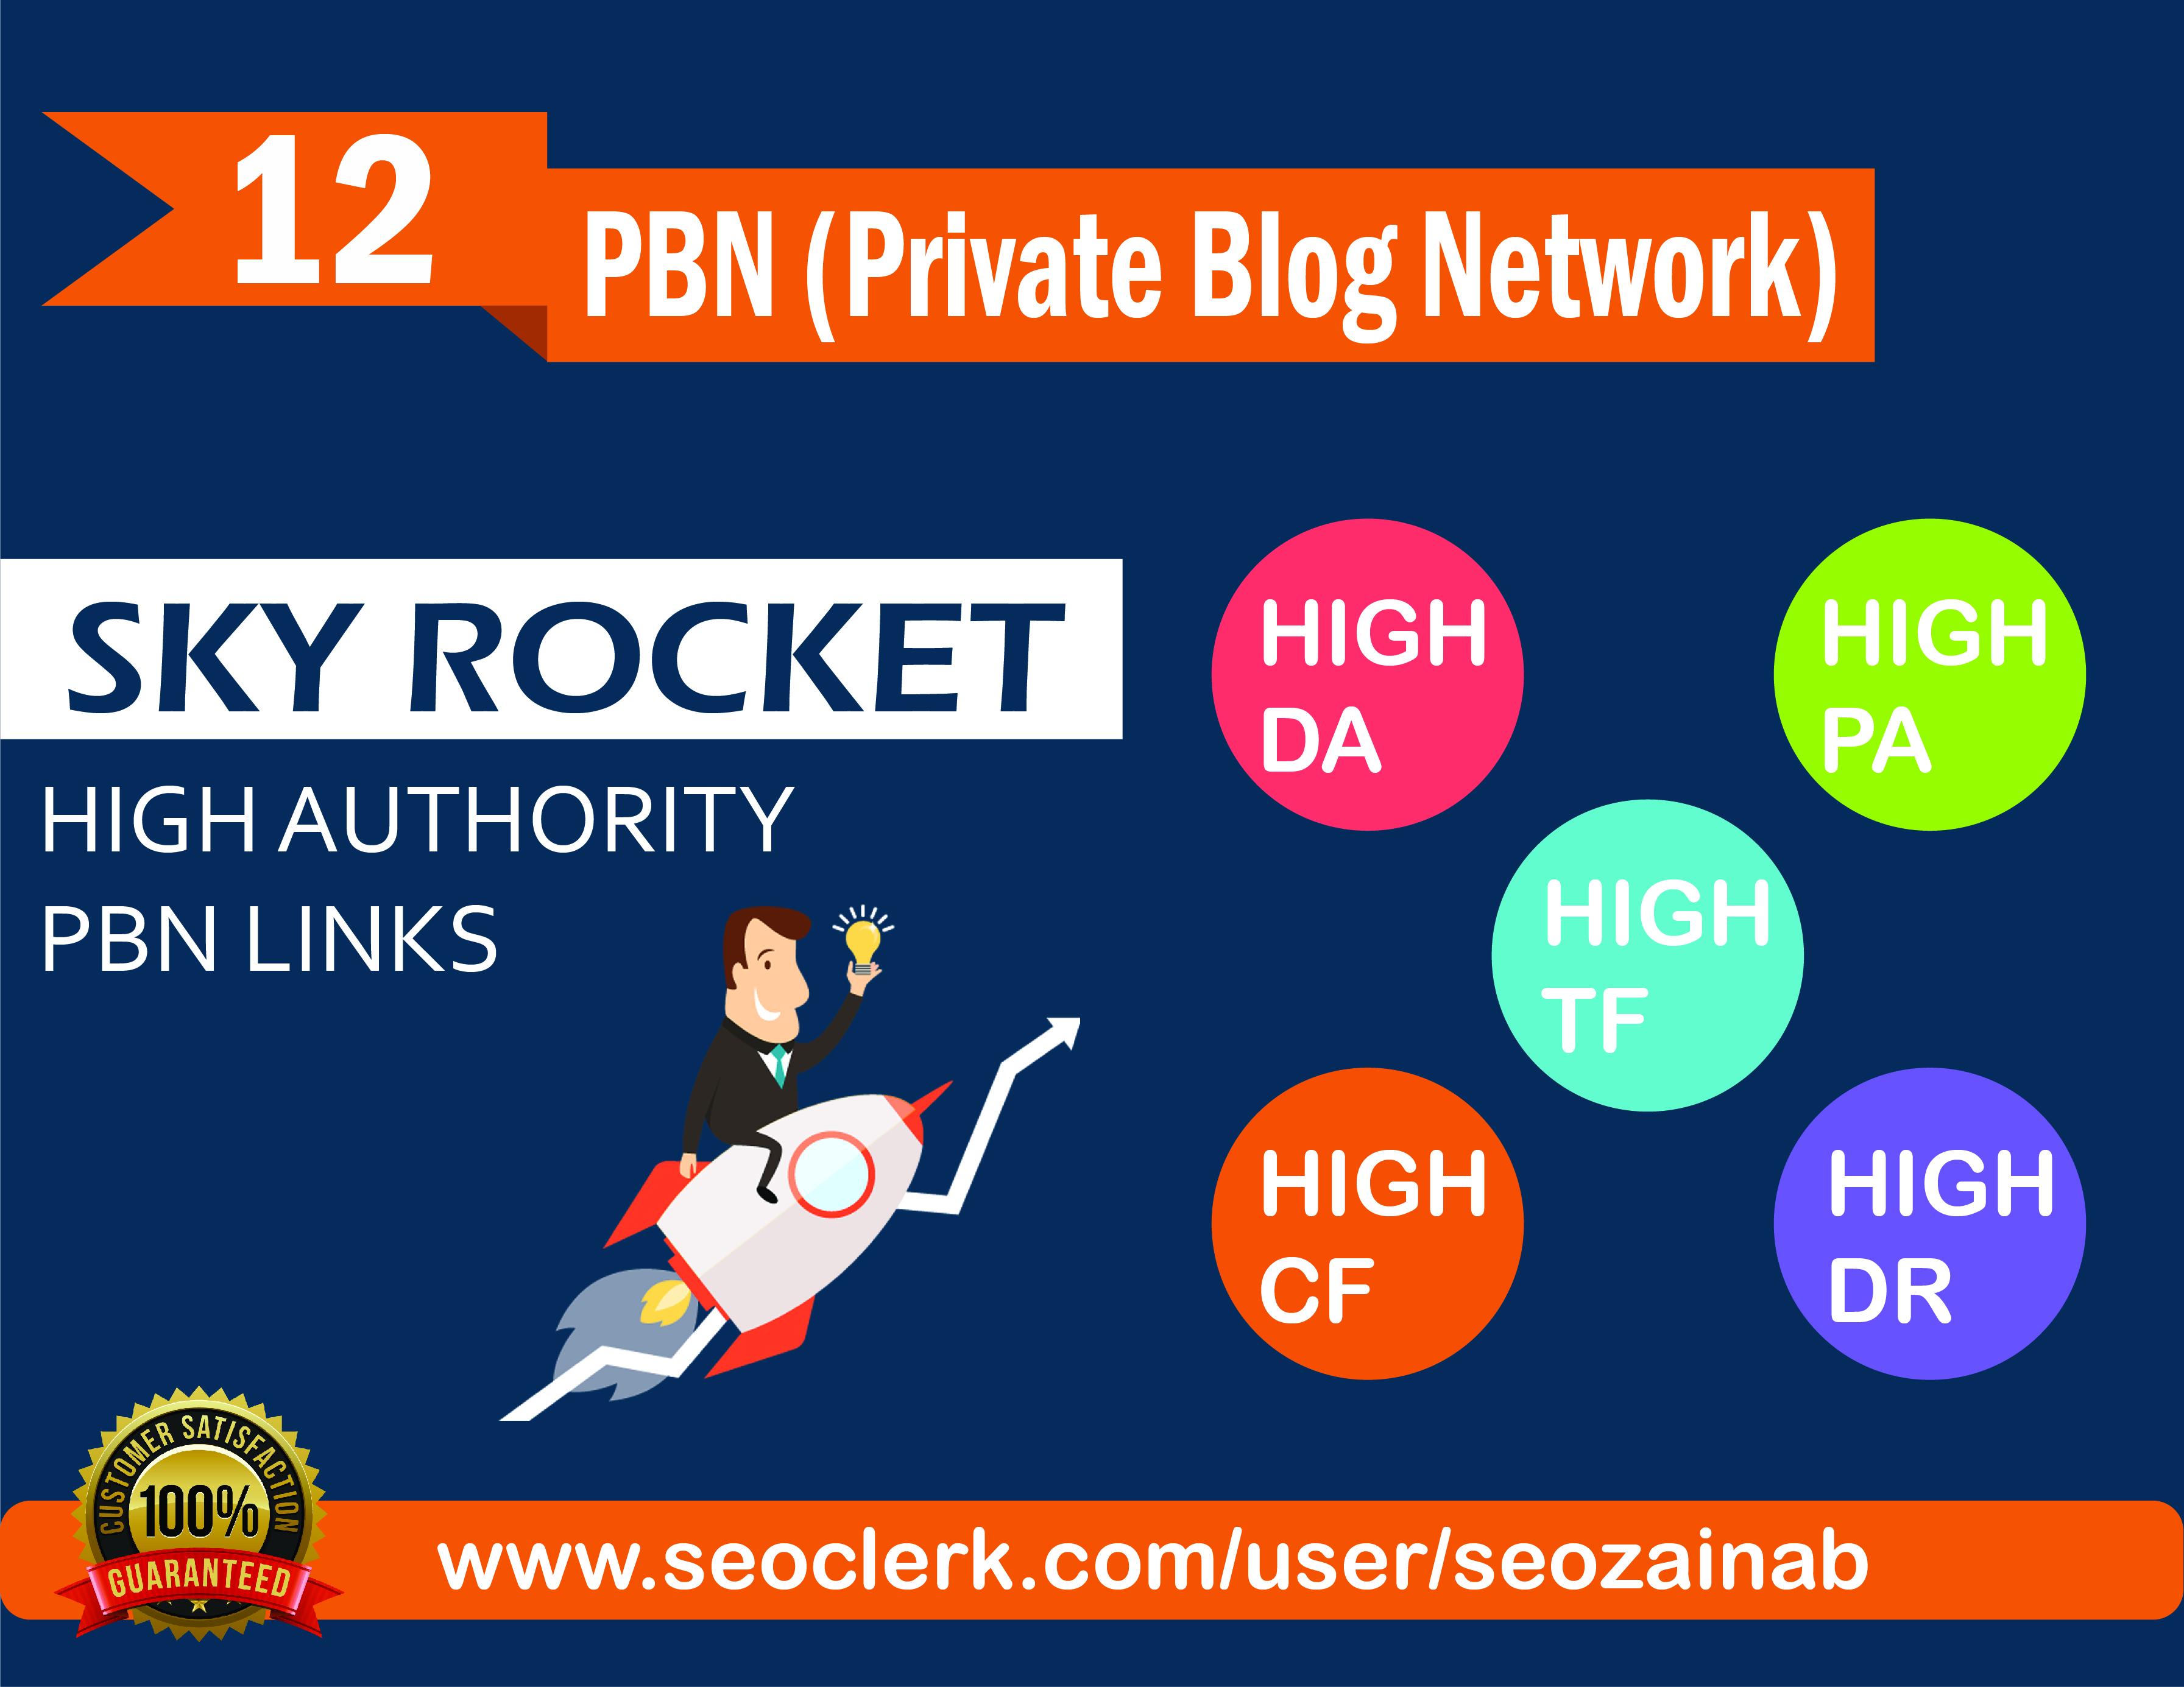 Build 12 High DA/PA TF/CF HomePage PBN Backlinks All Dofollow High Quality Backlinks